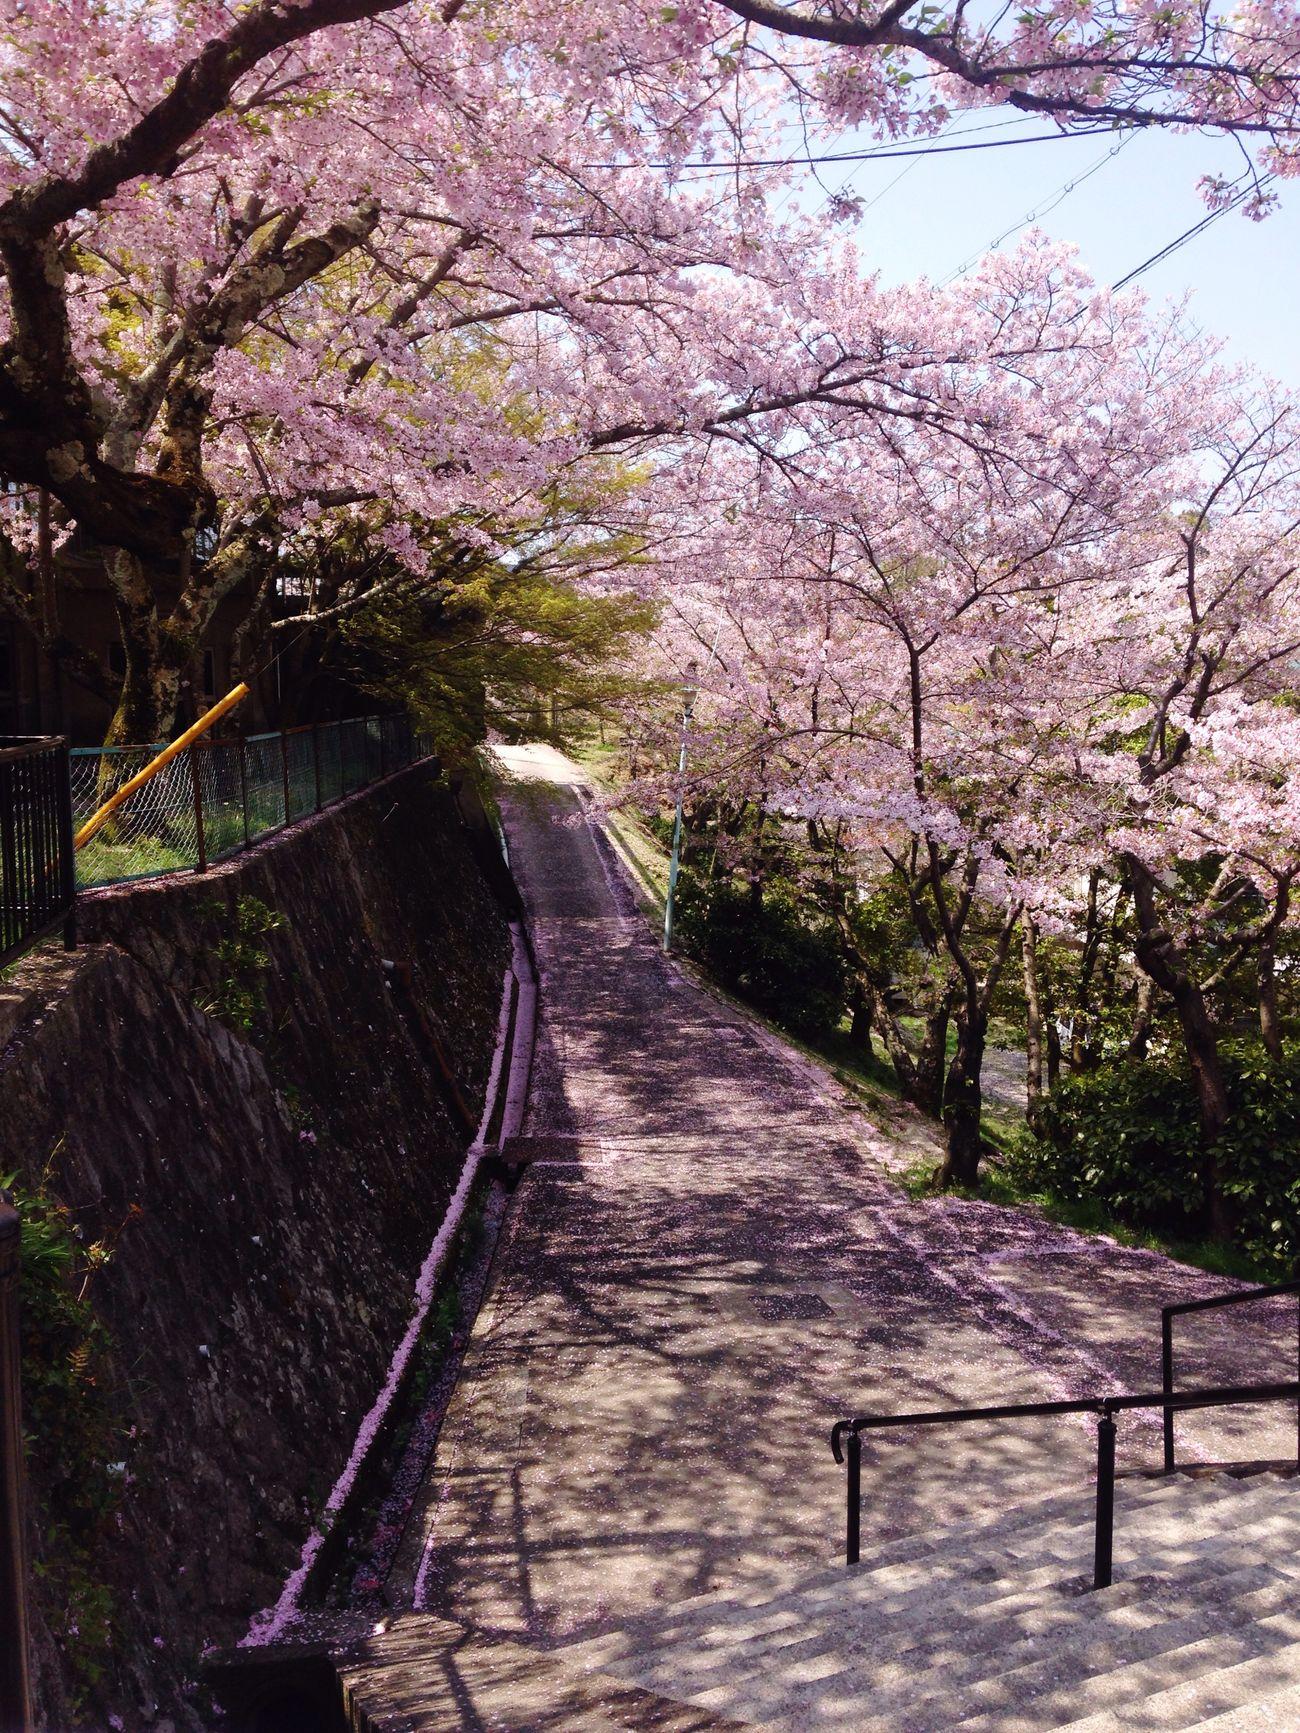 Senkoji Park Japan Japan Photography Onomichi, Japan Sakura Cherry Blossoms Spring Beautiful Niceweather Weekend SakuraFubuki